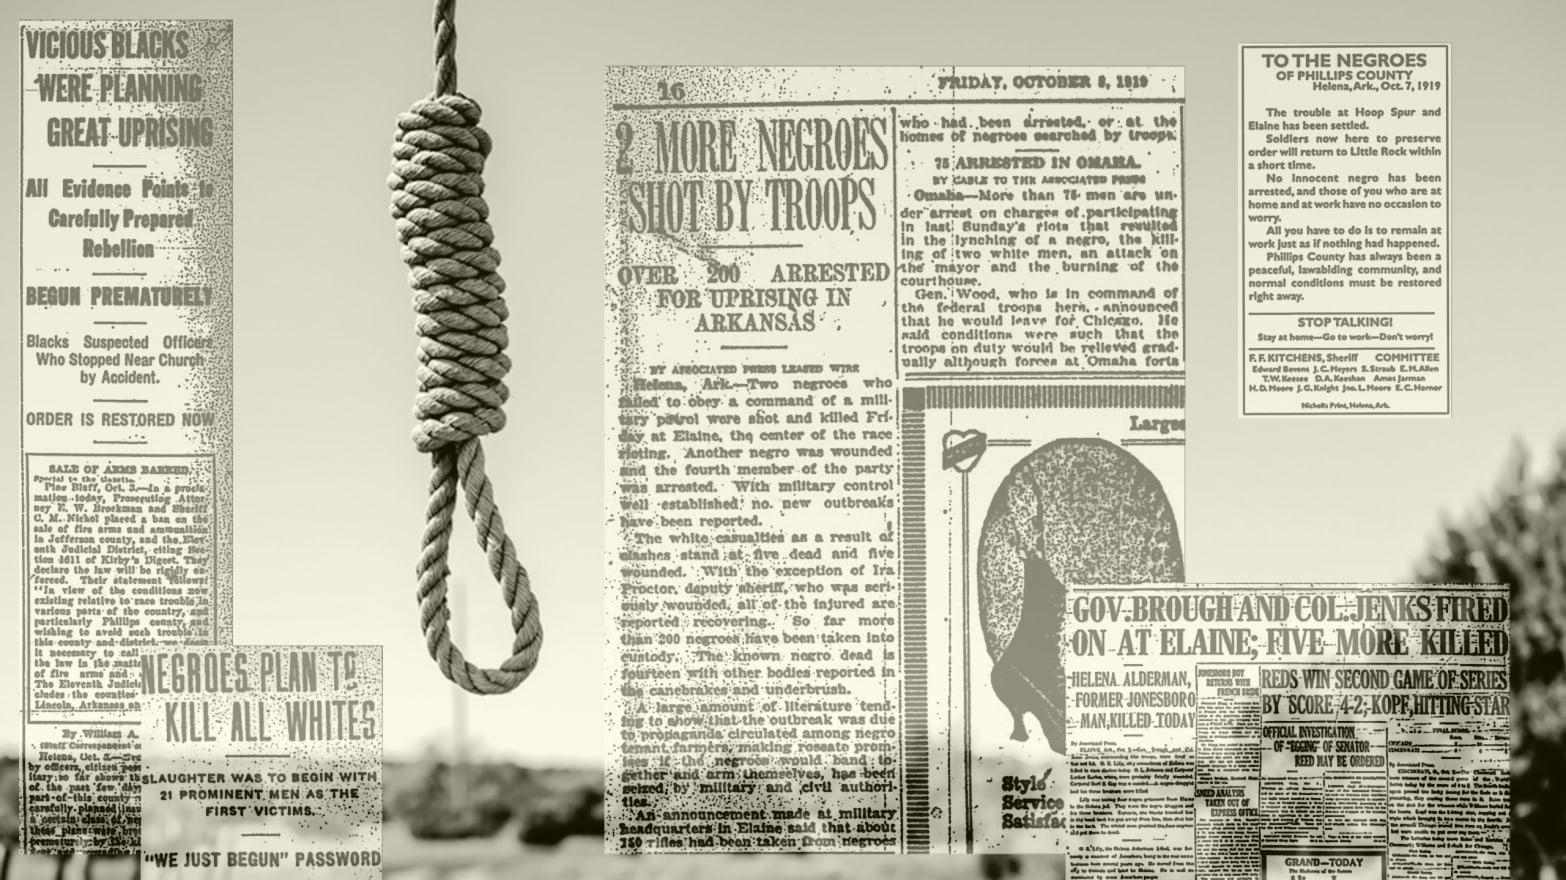 America's Forgotten Mass Lynching: When 237 People Were